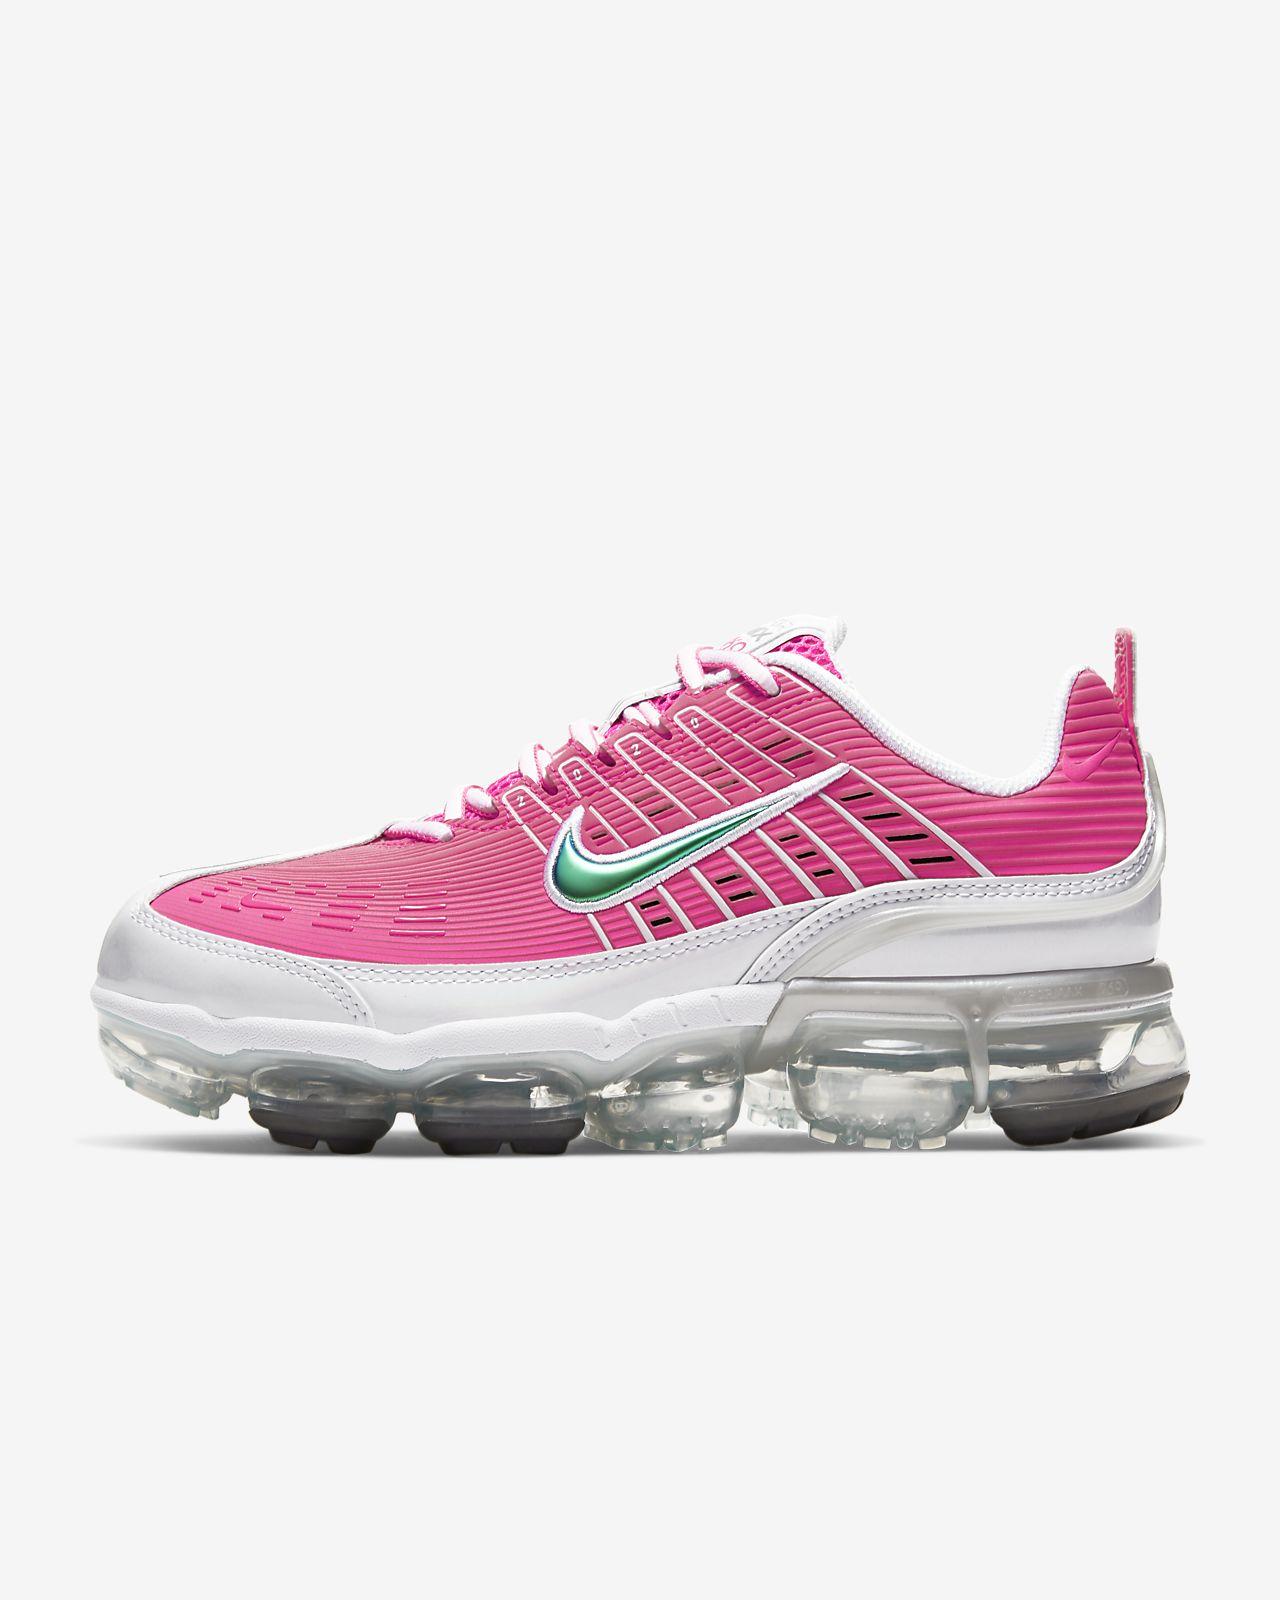 Women Air Max TN White Pink,nike usa soccer jersey